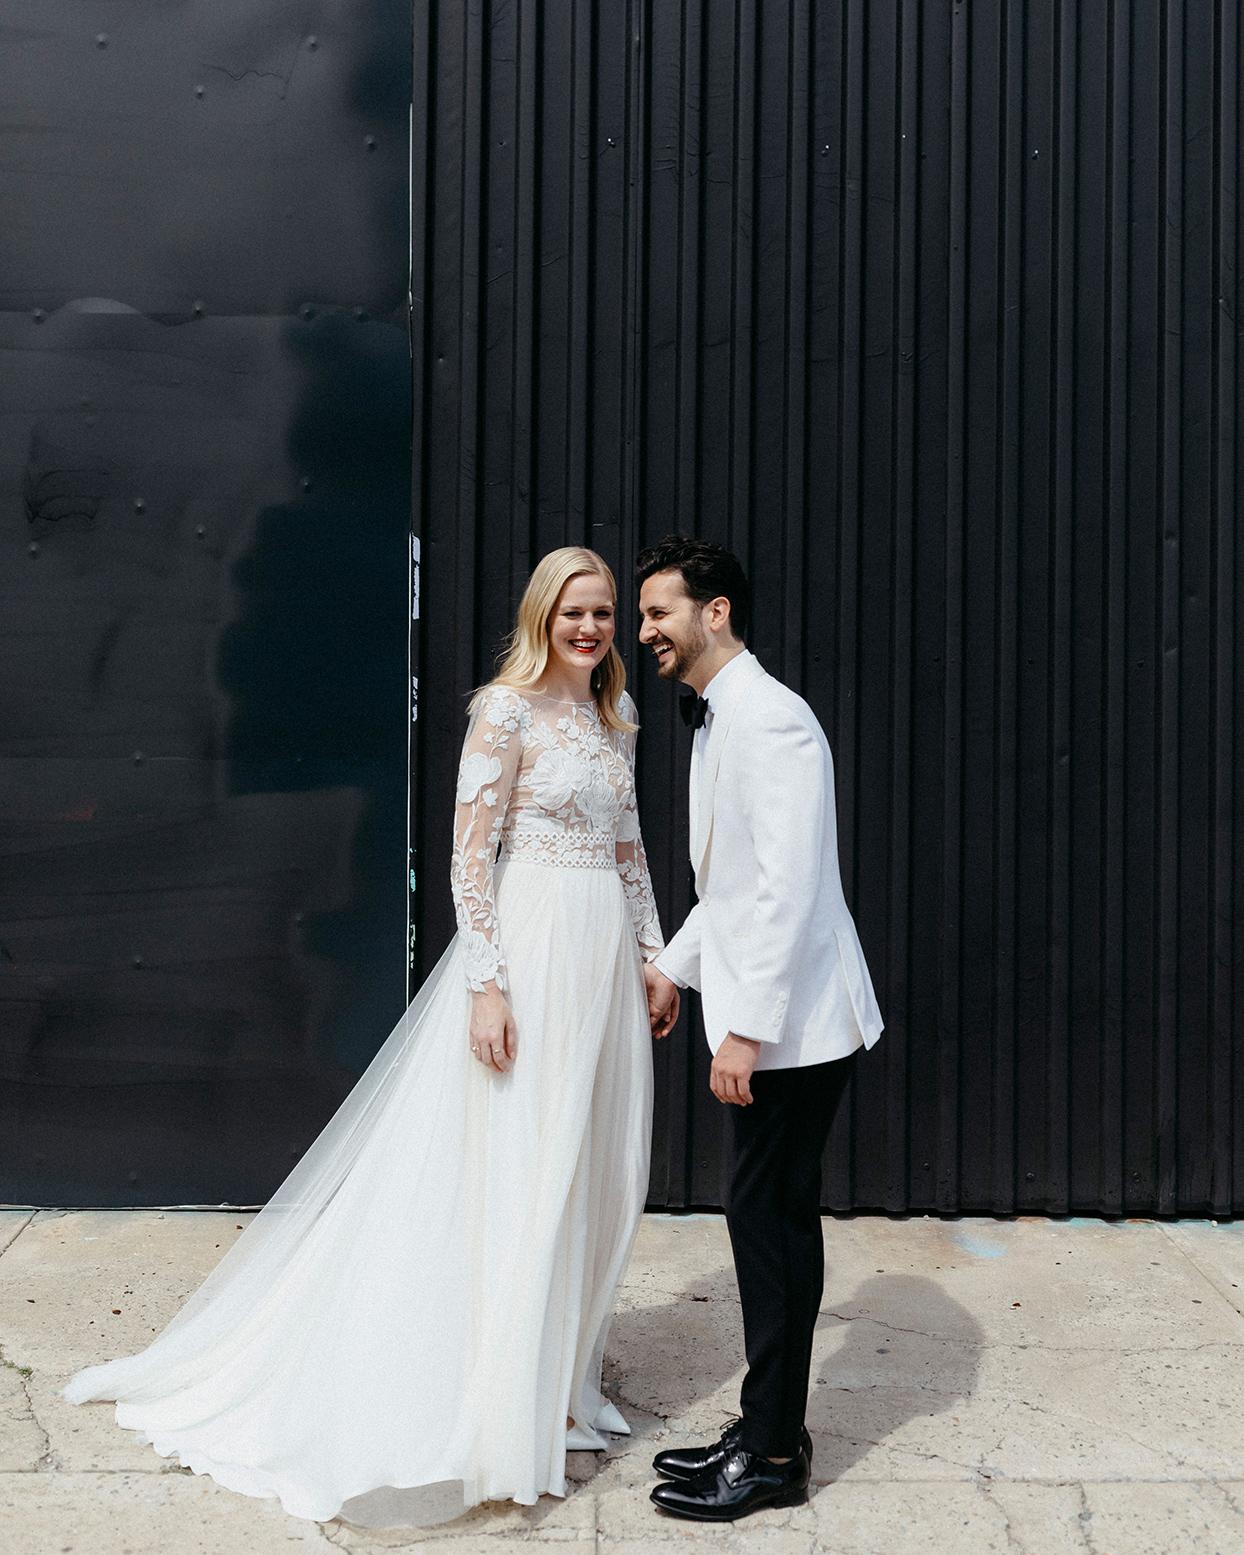 kristen jonathan wedding couple black wall